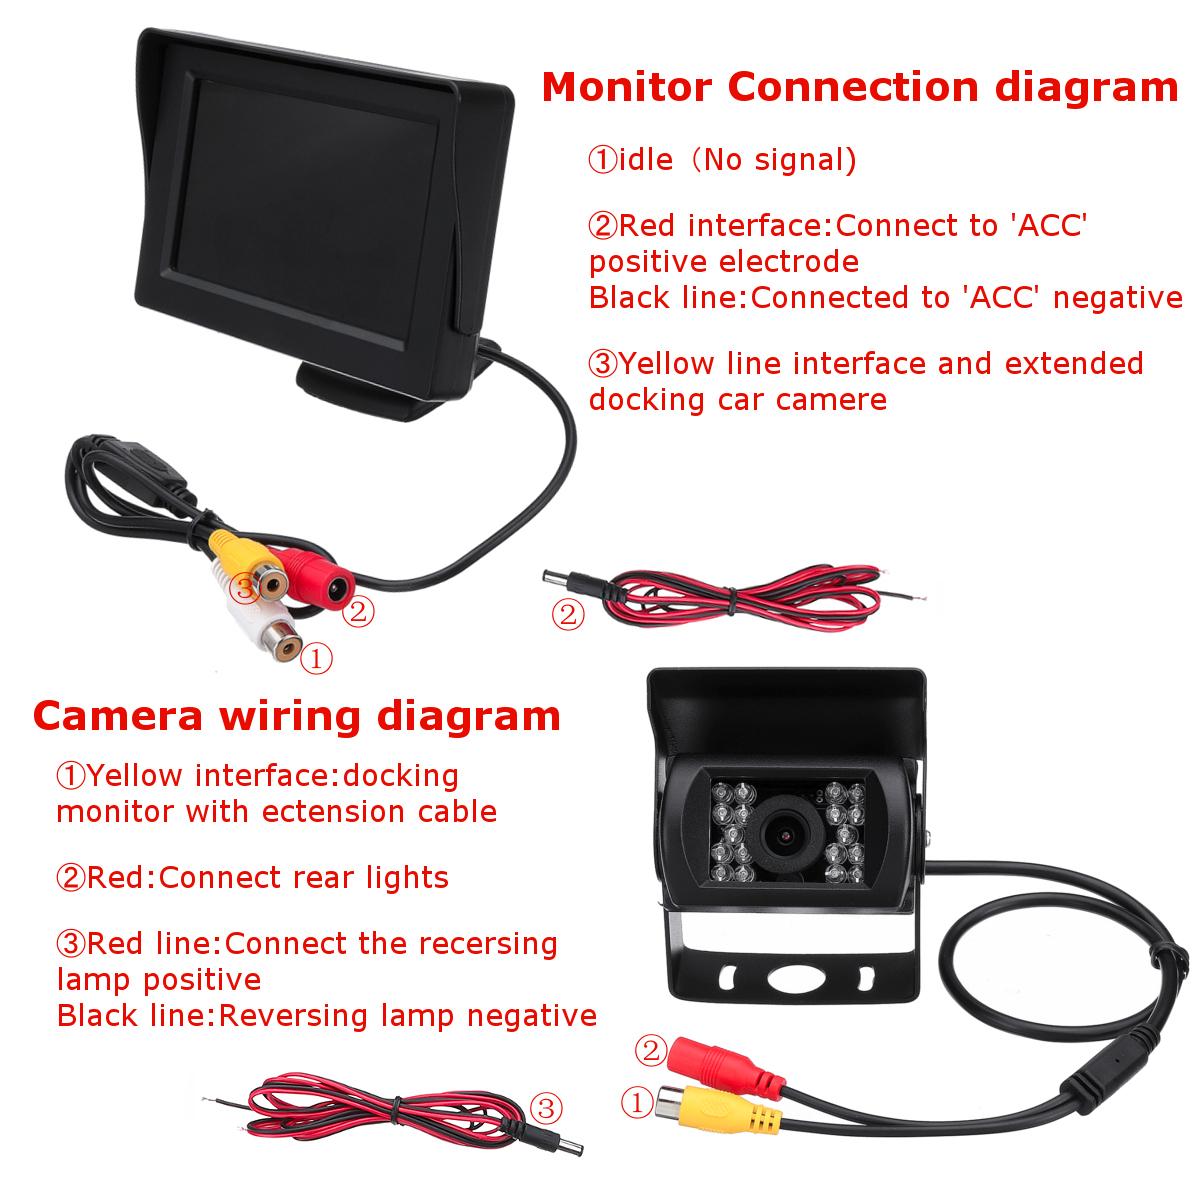 2.4G Wireless Car Rear View Camera+4.3 Inch Monitor For 12-24V Truck - Tft Lcd Monitor Reversing Camera Wiring Diagram